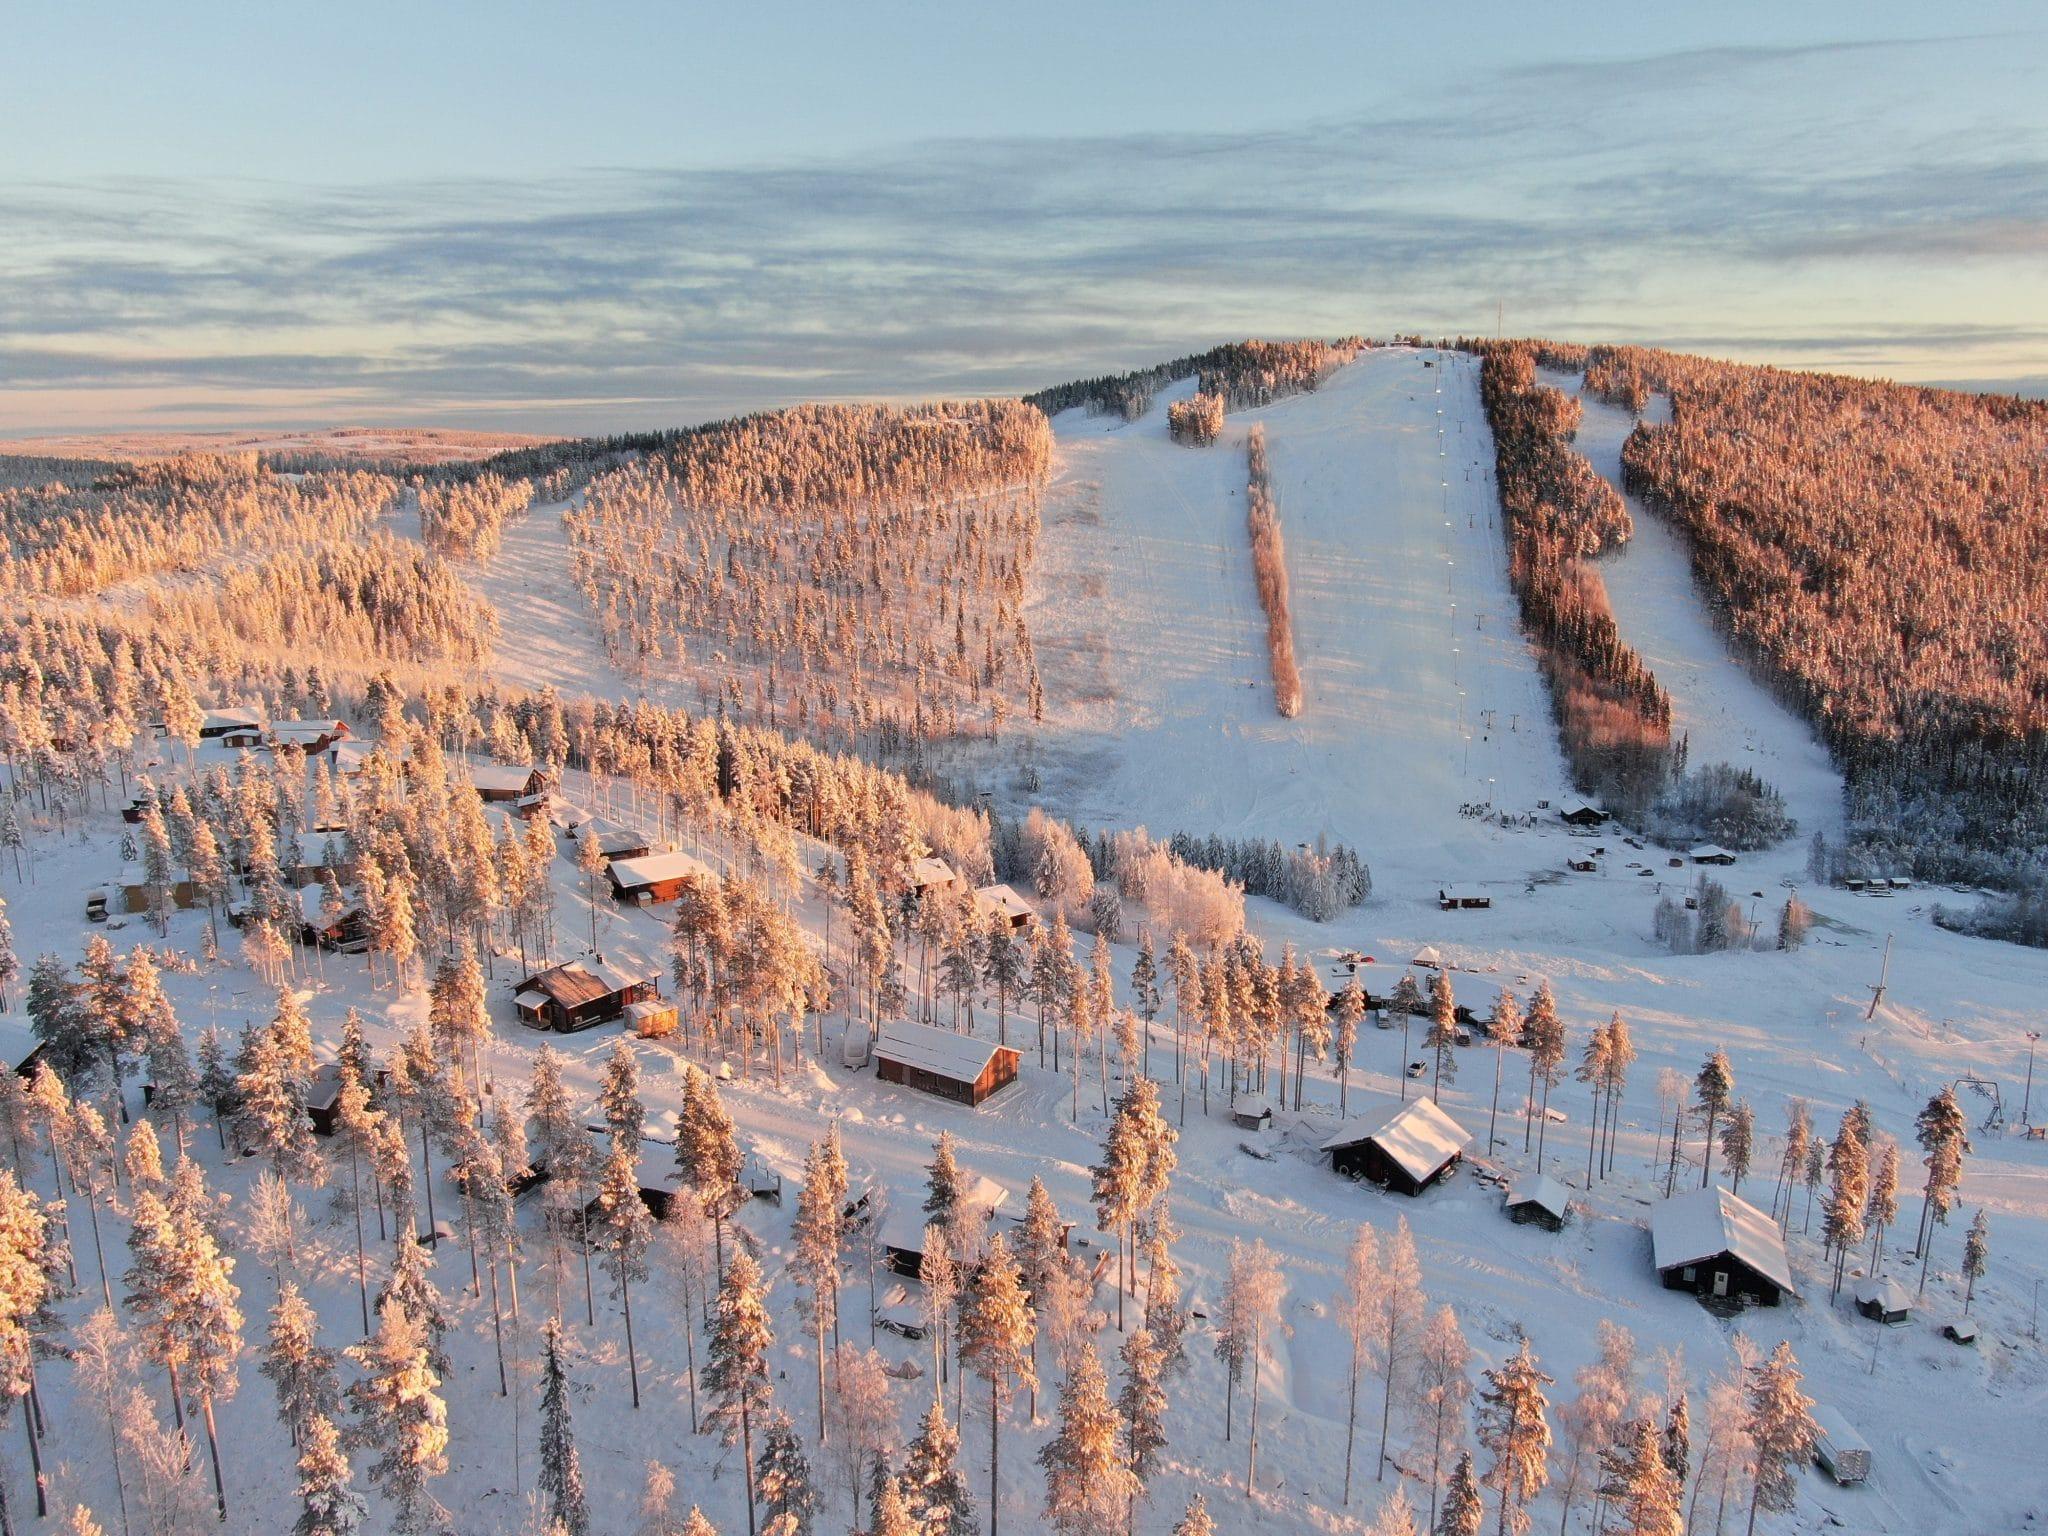 edek_vinter